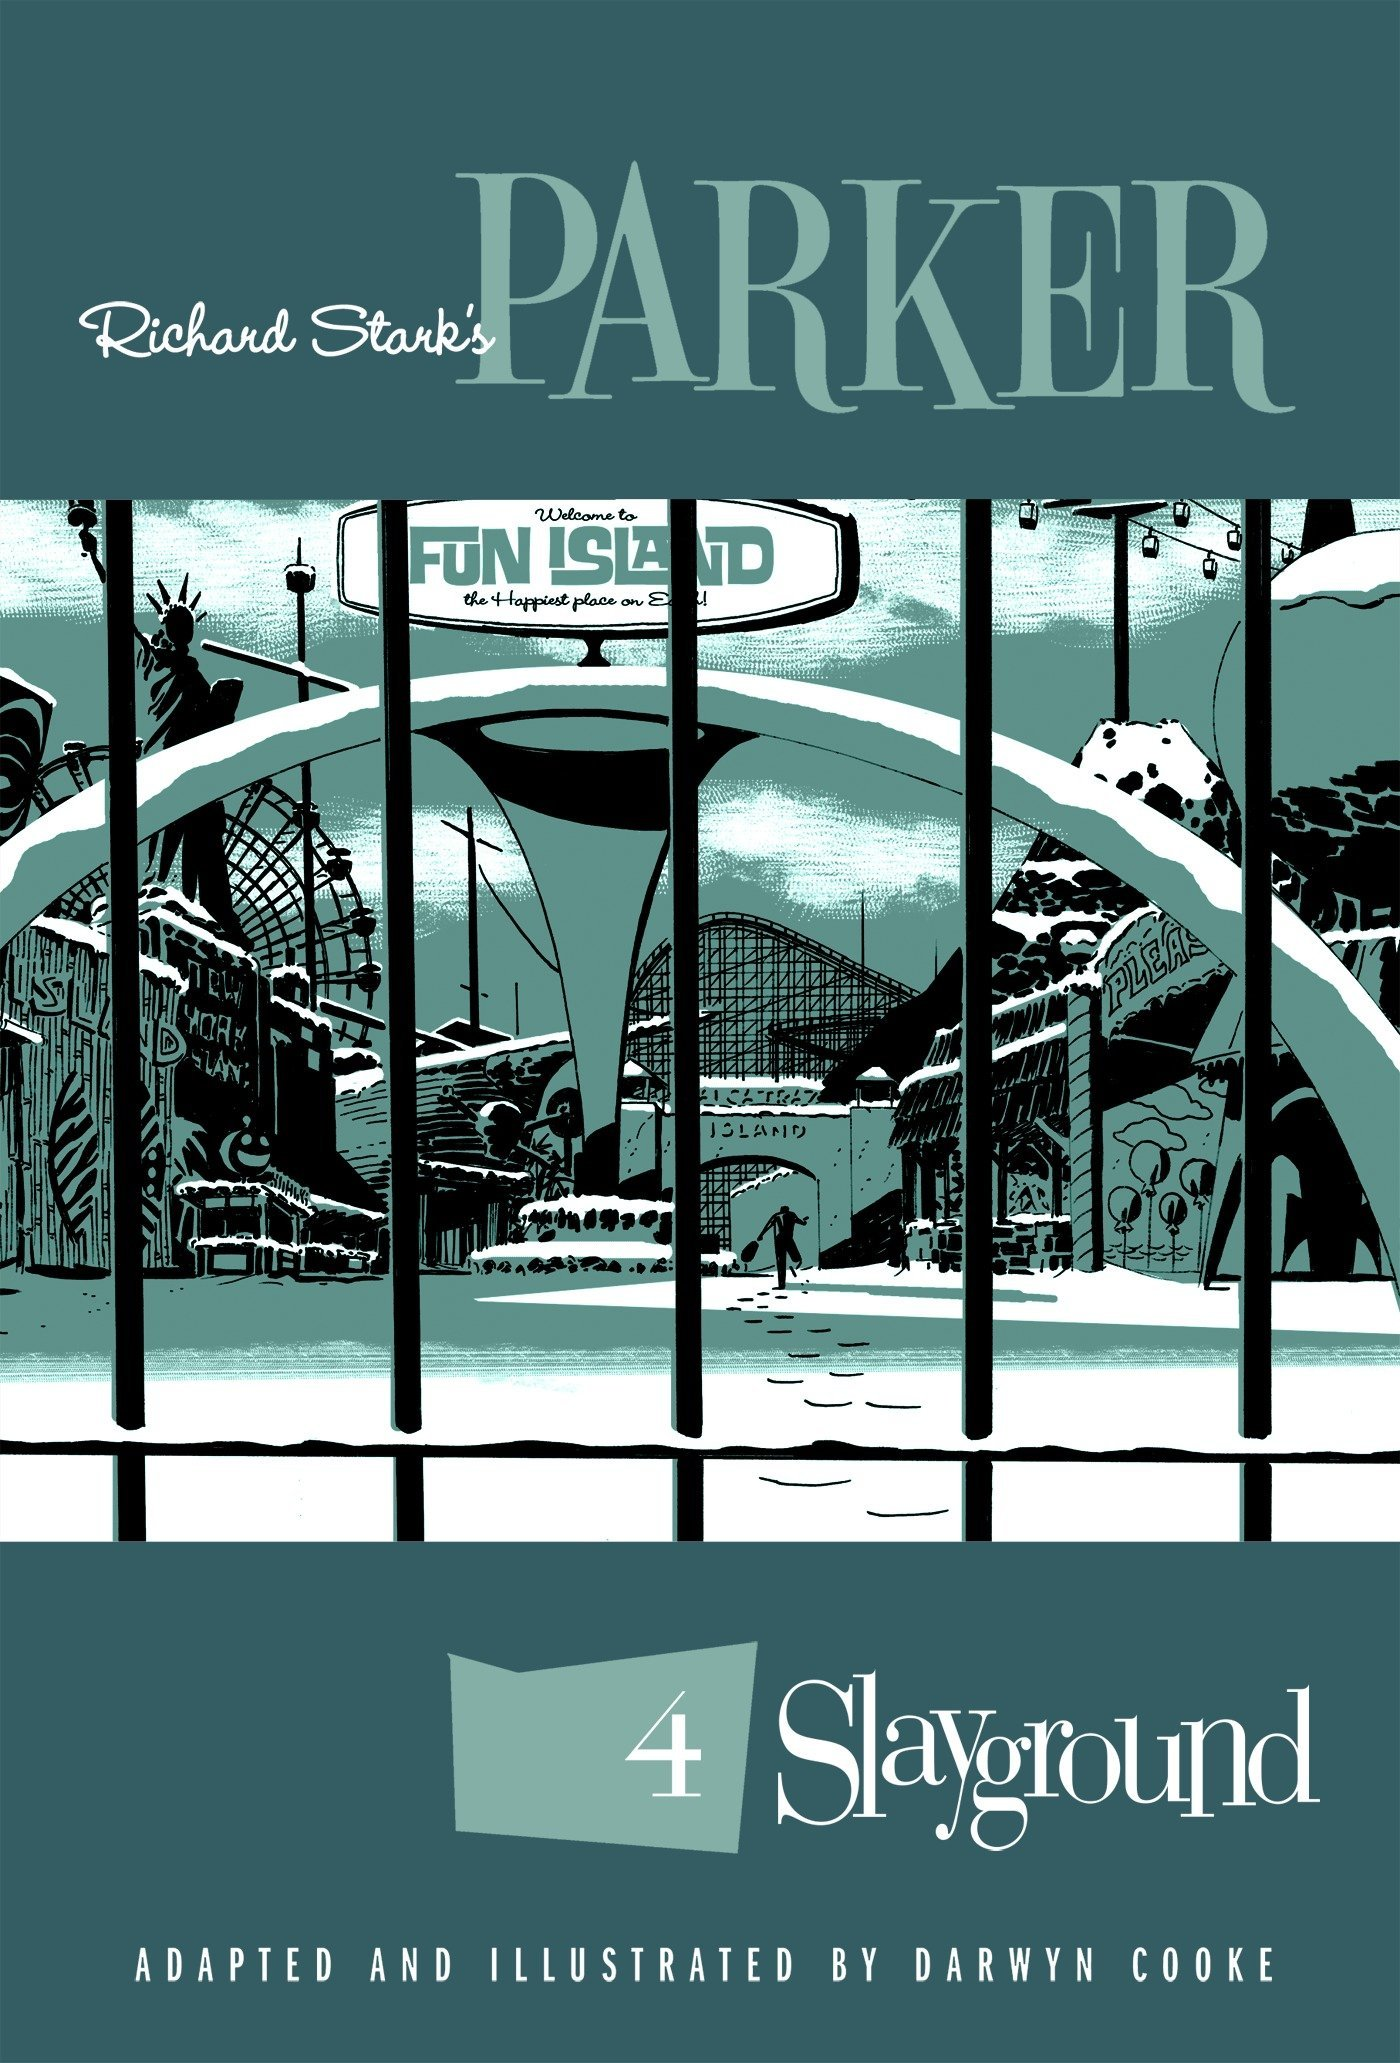 Amazon Com Richard Stark S Parker Slayground 9781684051267 Stark Richard Cooke Darwyn Cooke Darwyn Books